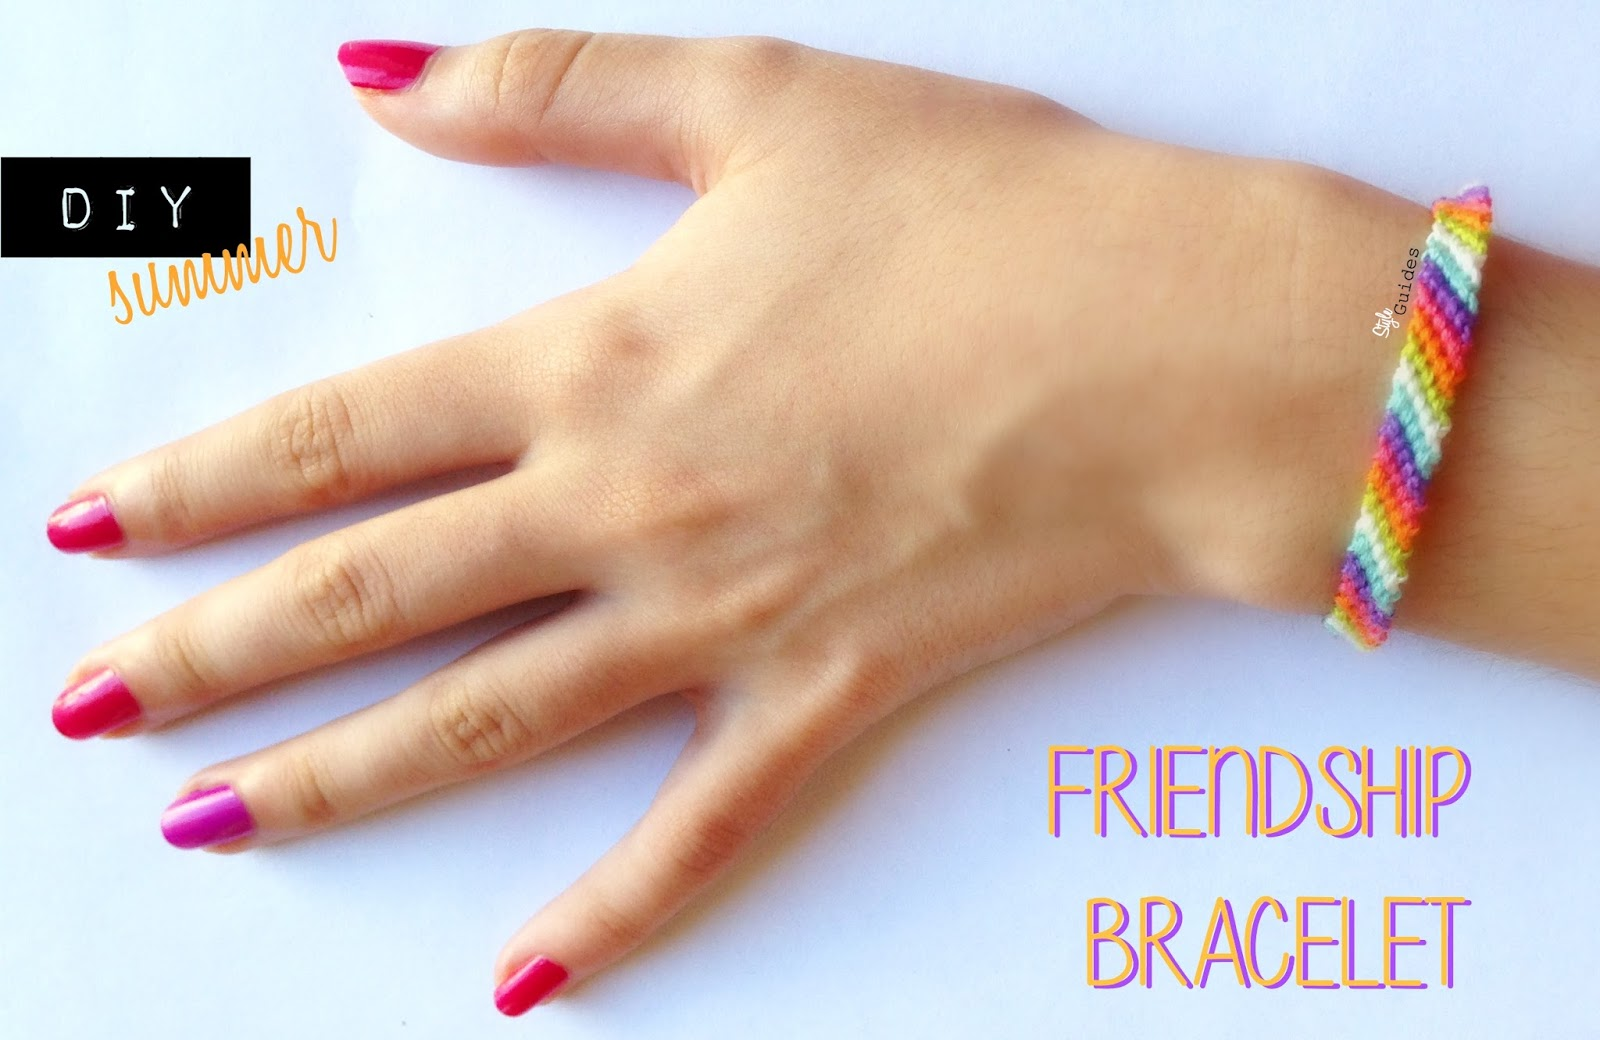 diy Friendship bracelet fashion